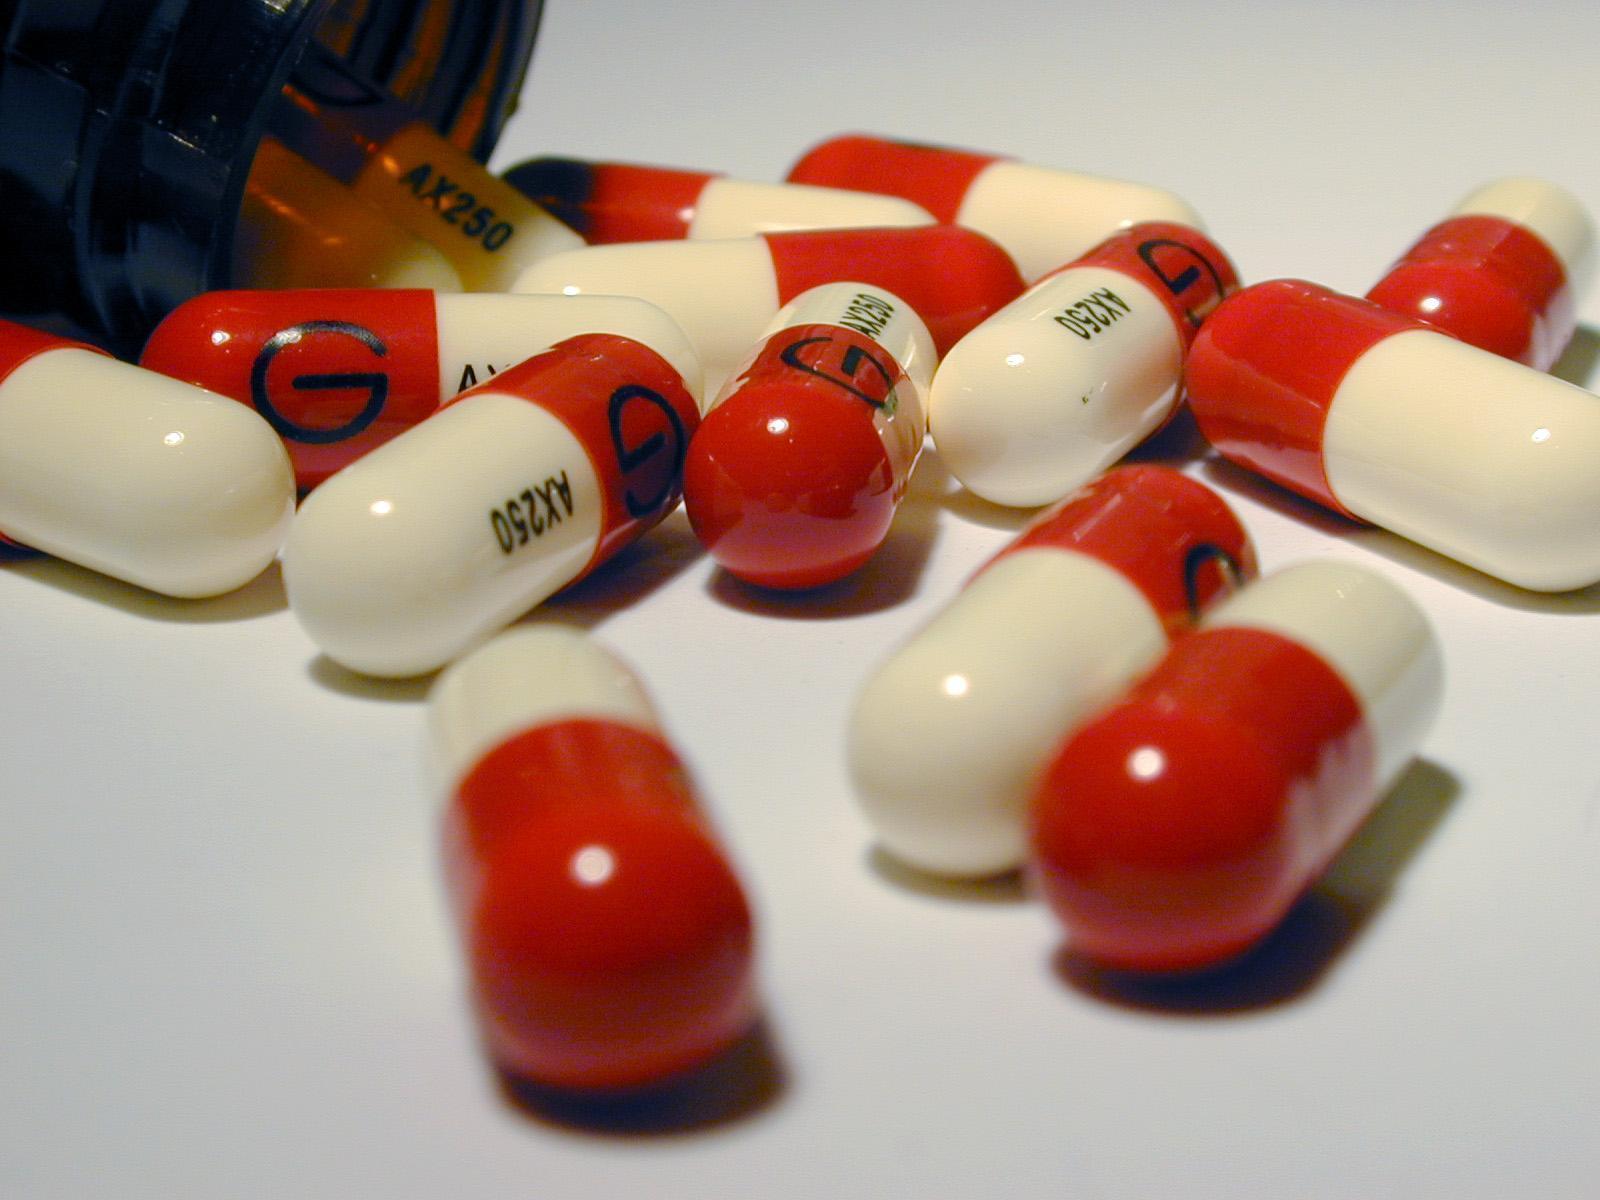 Antibióticos Caseiros – Antibióticos Para Garganta, Amígdalas, Bronquite e Resfriado